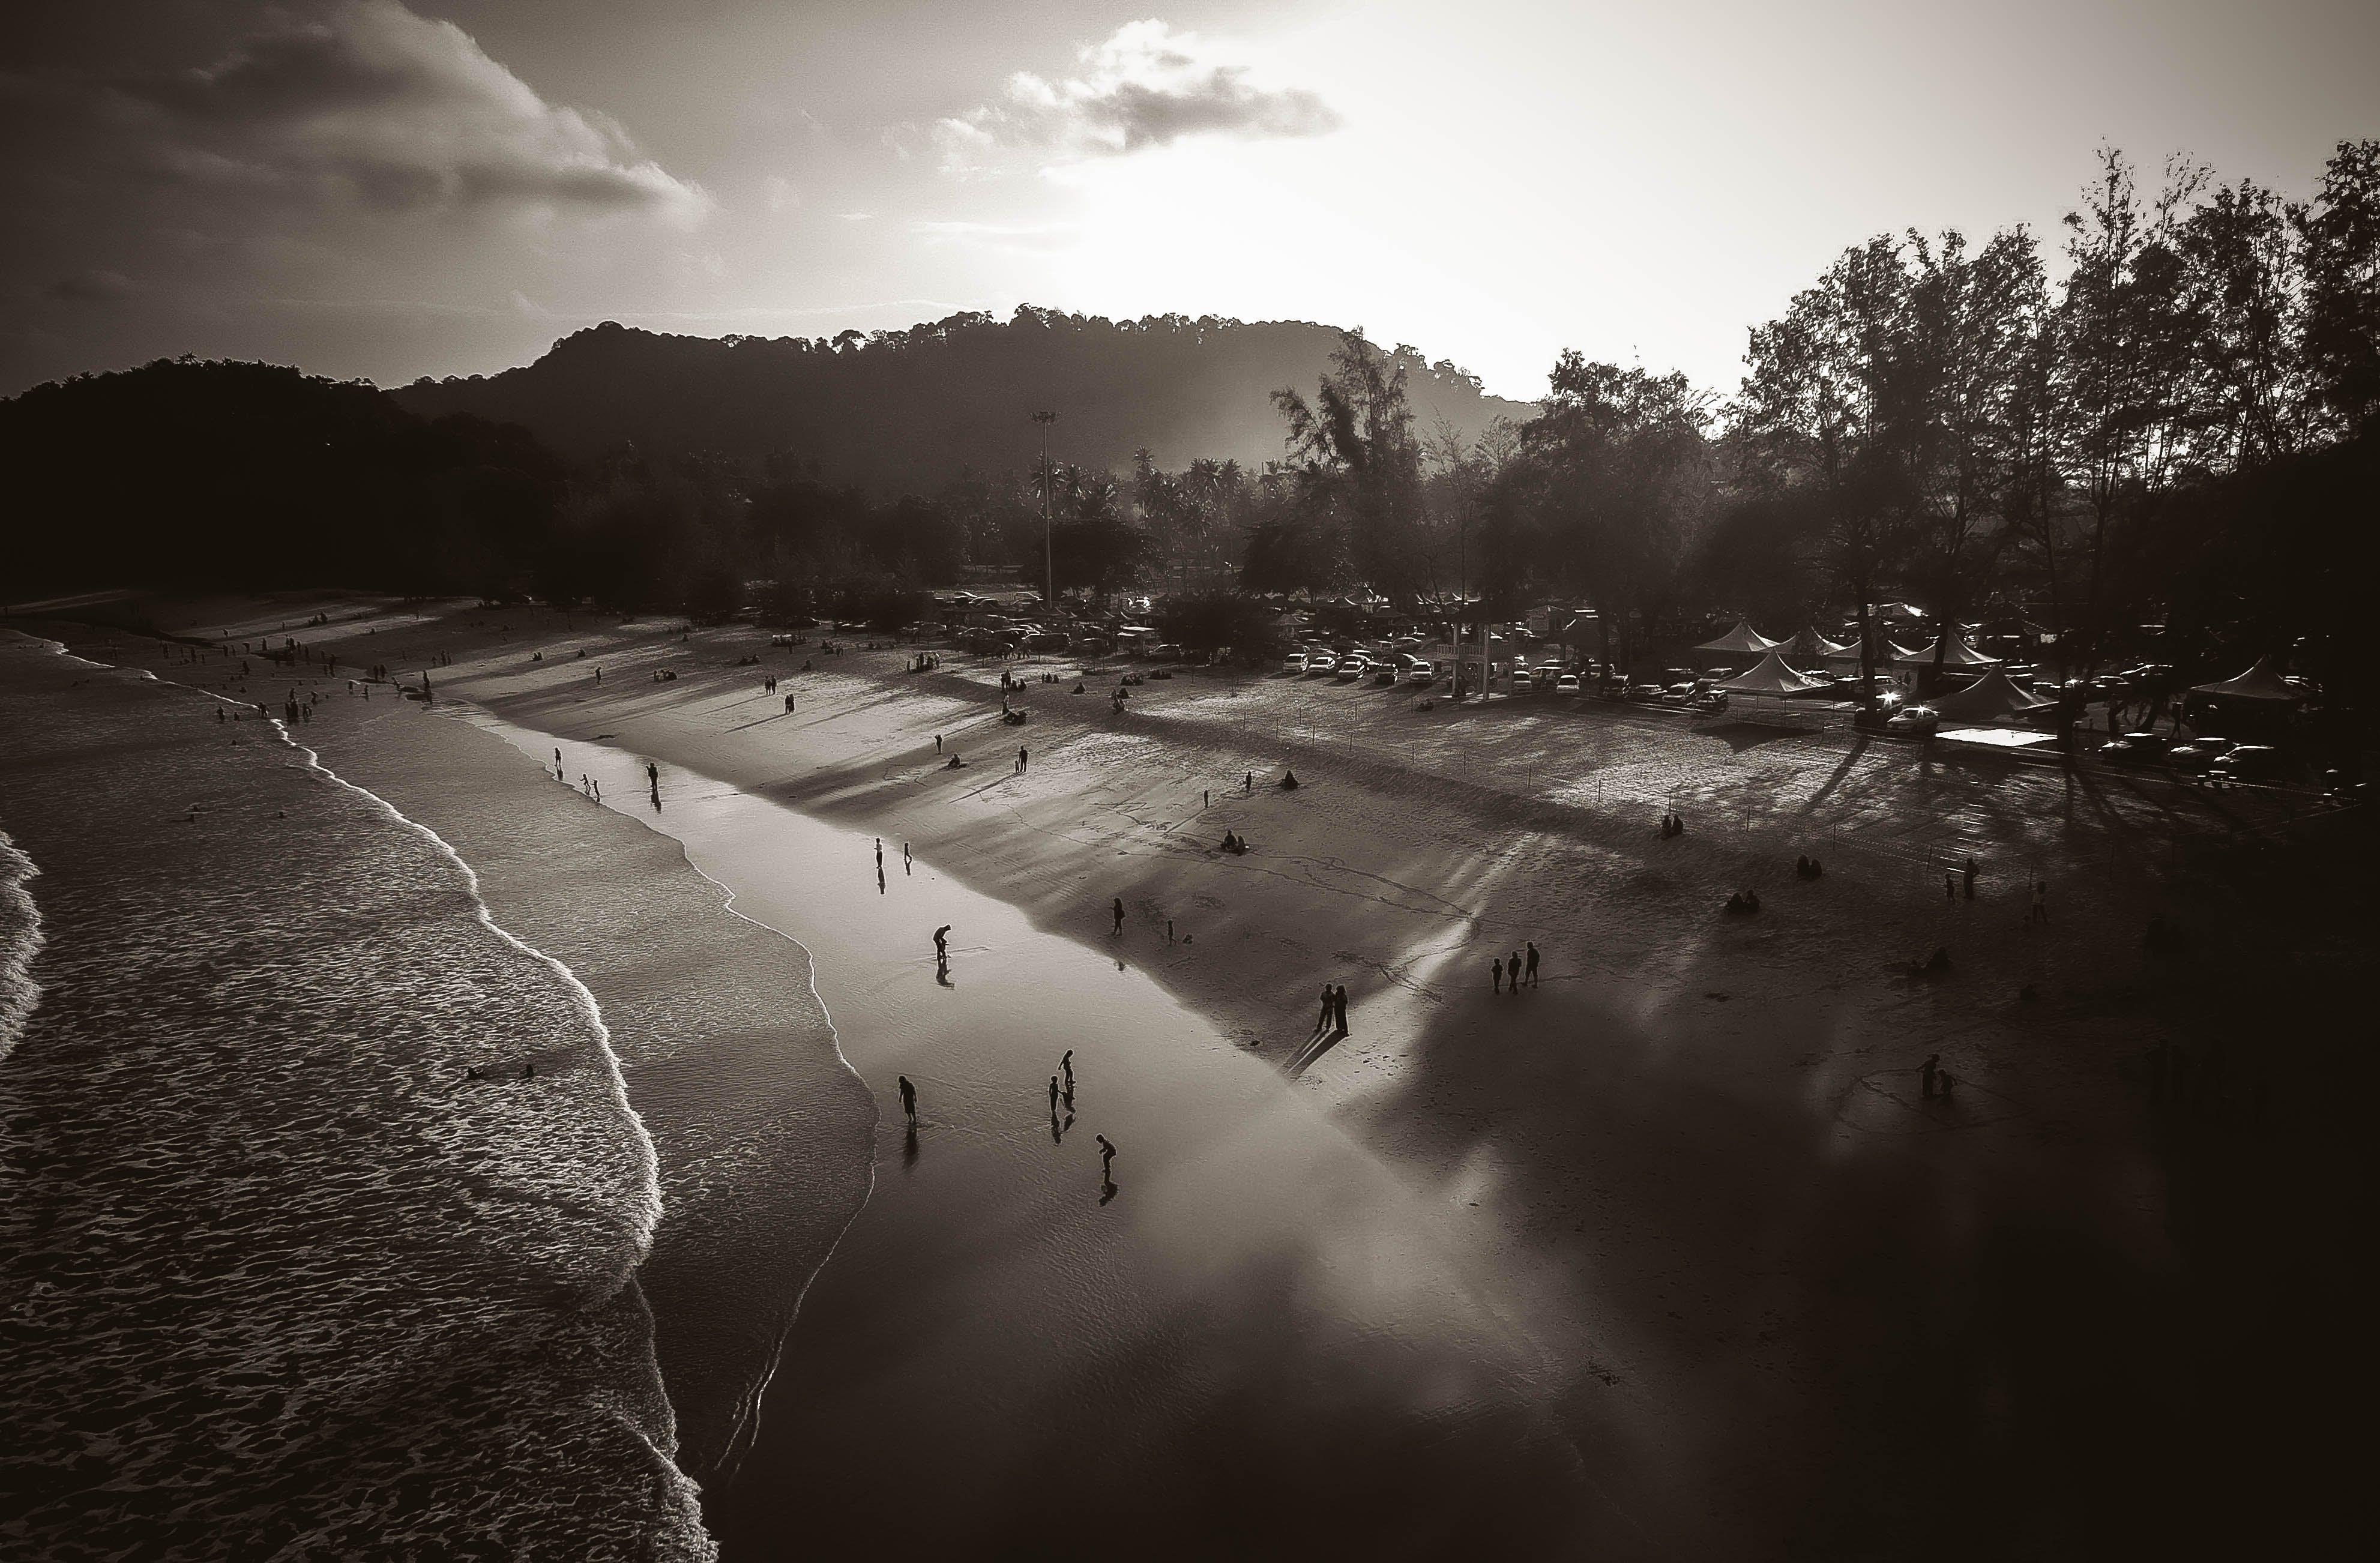 People on Beach Grayscale Photo